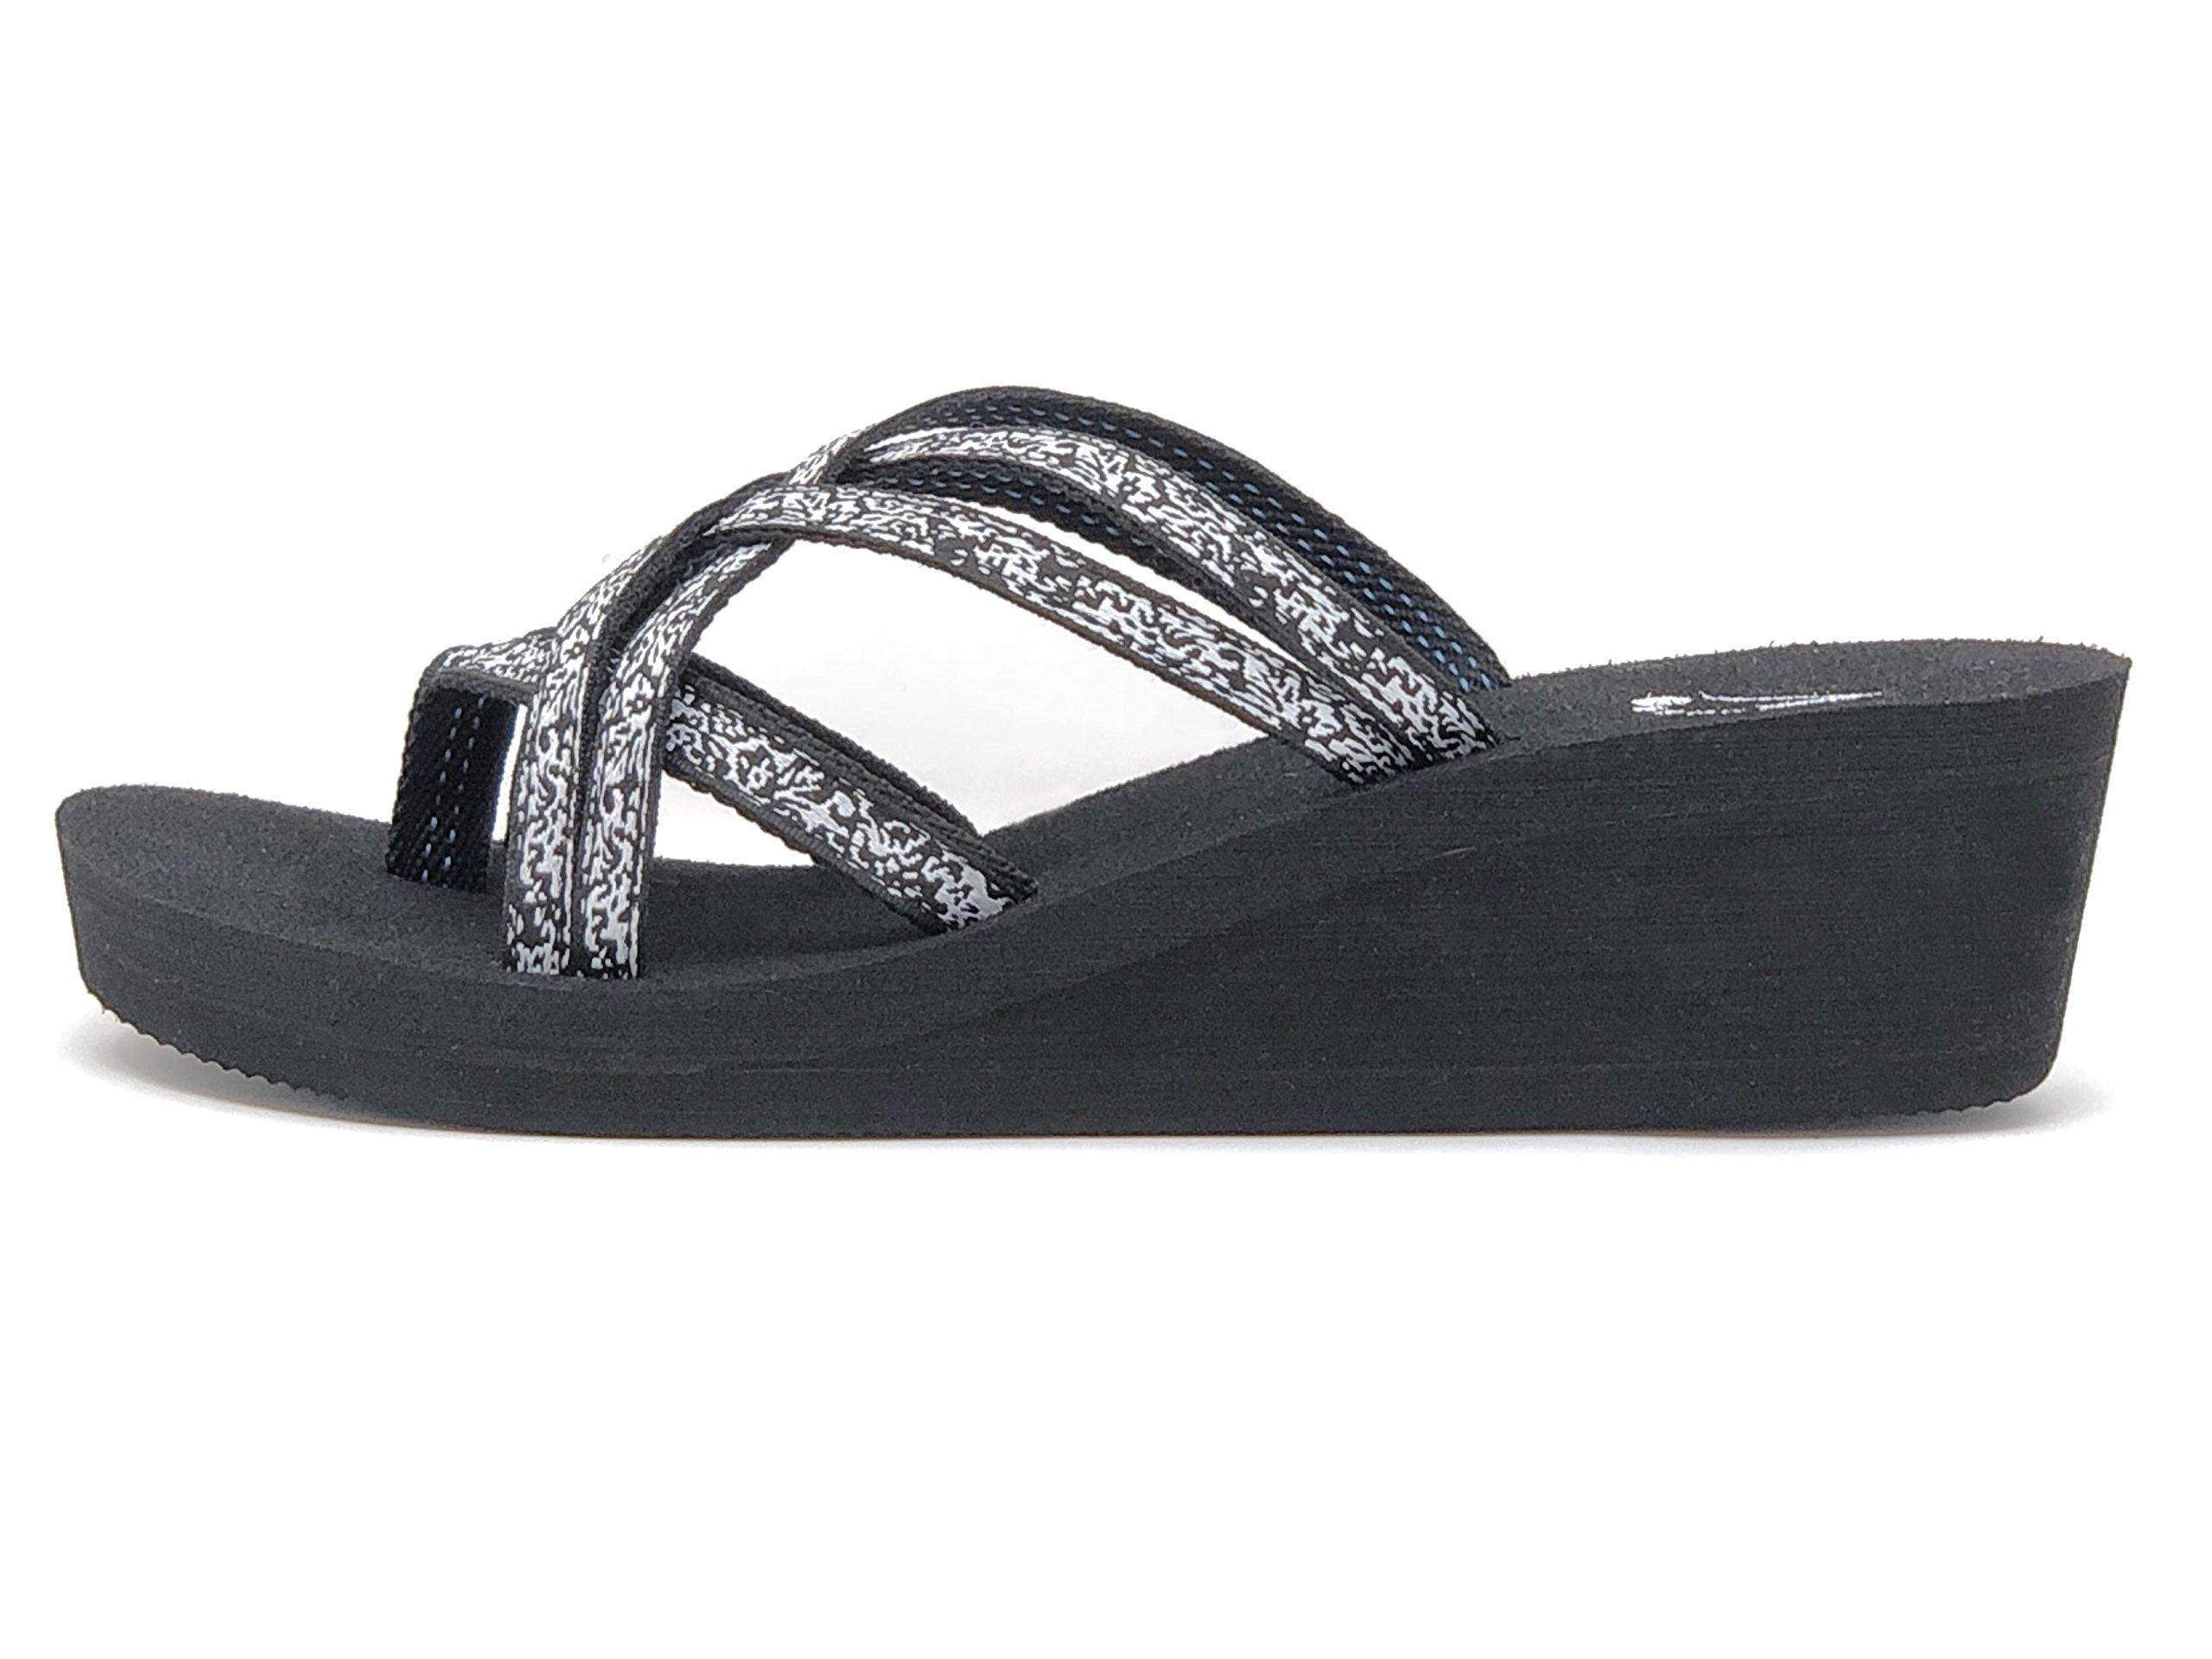 Viakix Wedge Flip Flops for Women – Comfortable, Stylish, Cute, Women's Strappy Sandal for Walking, Beach, Travel by Viakix (Image #4)